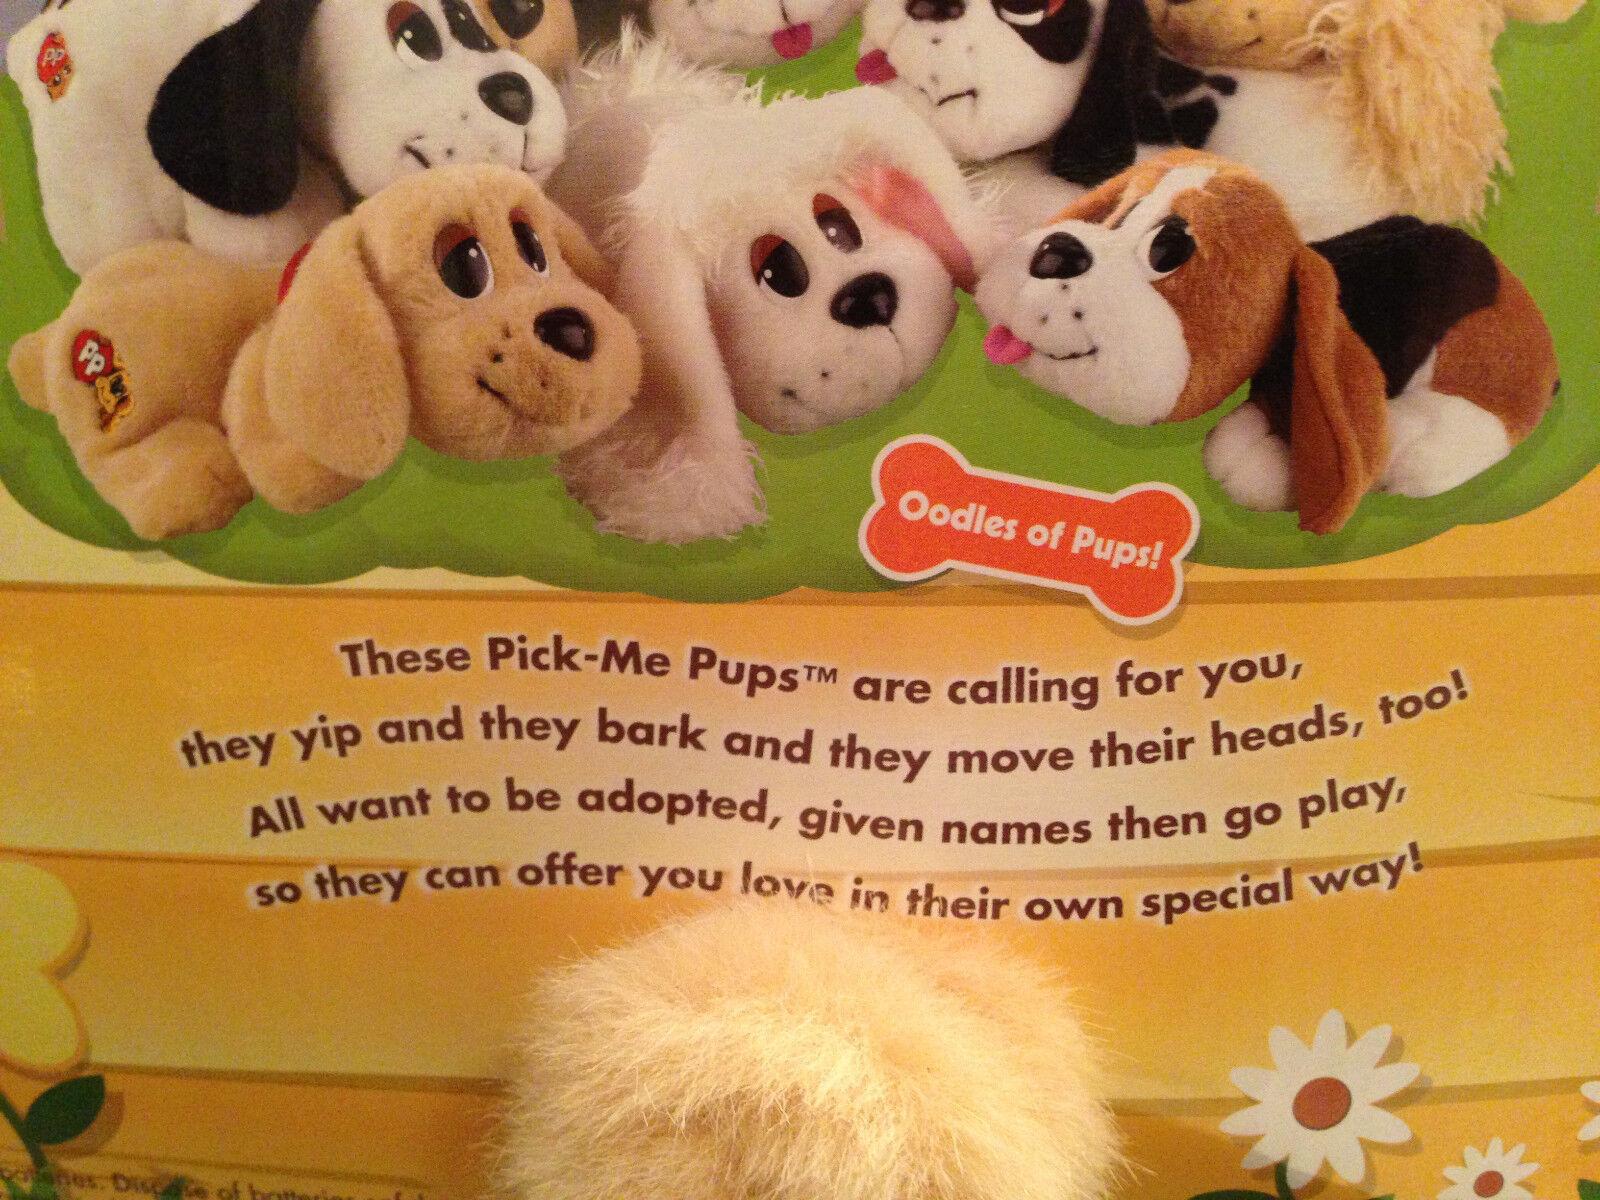 Pound Puppies Pick Me Pups CockerSpaniel Toy Plush Animated 2004